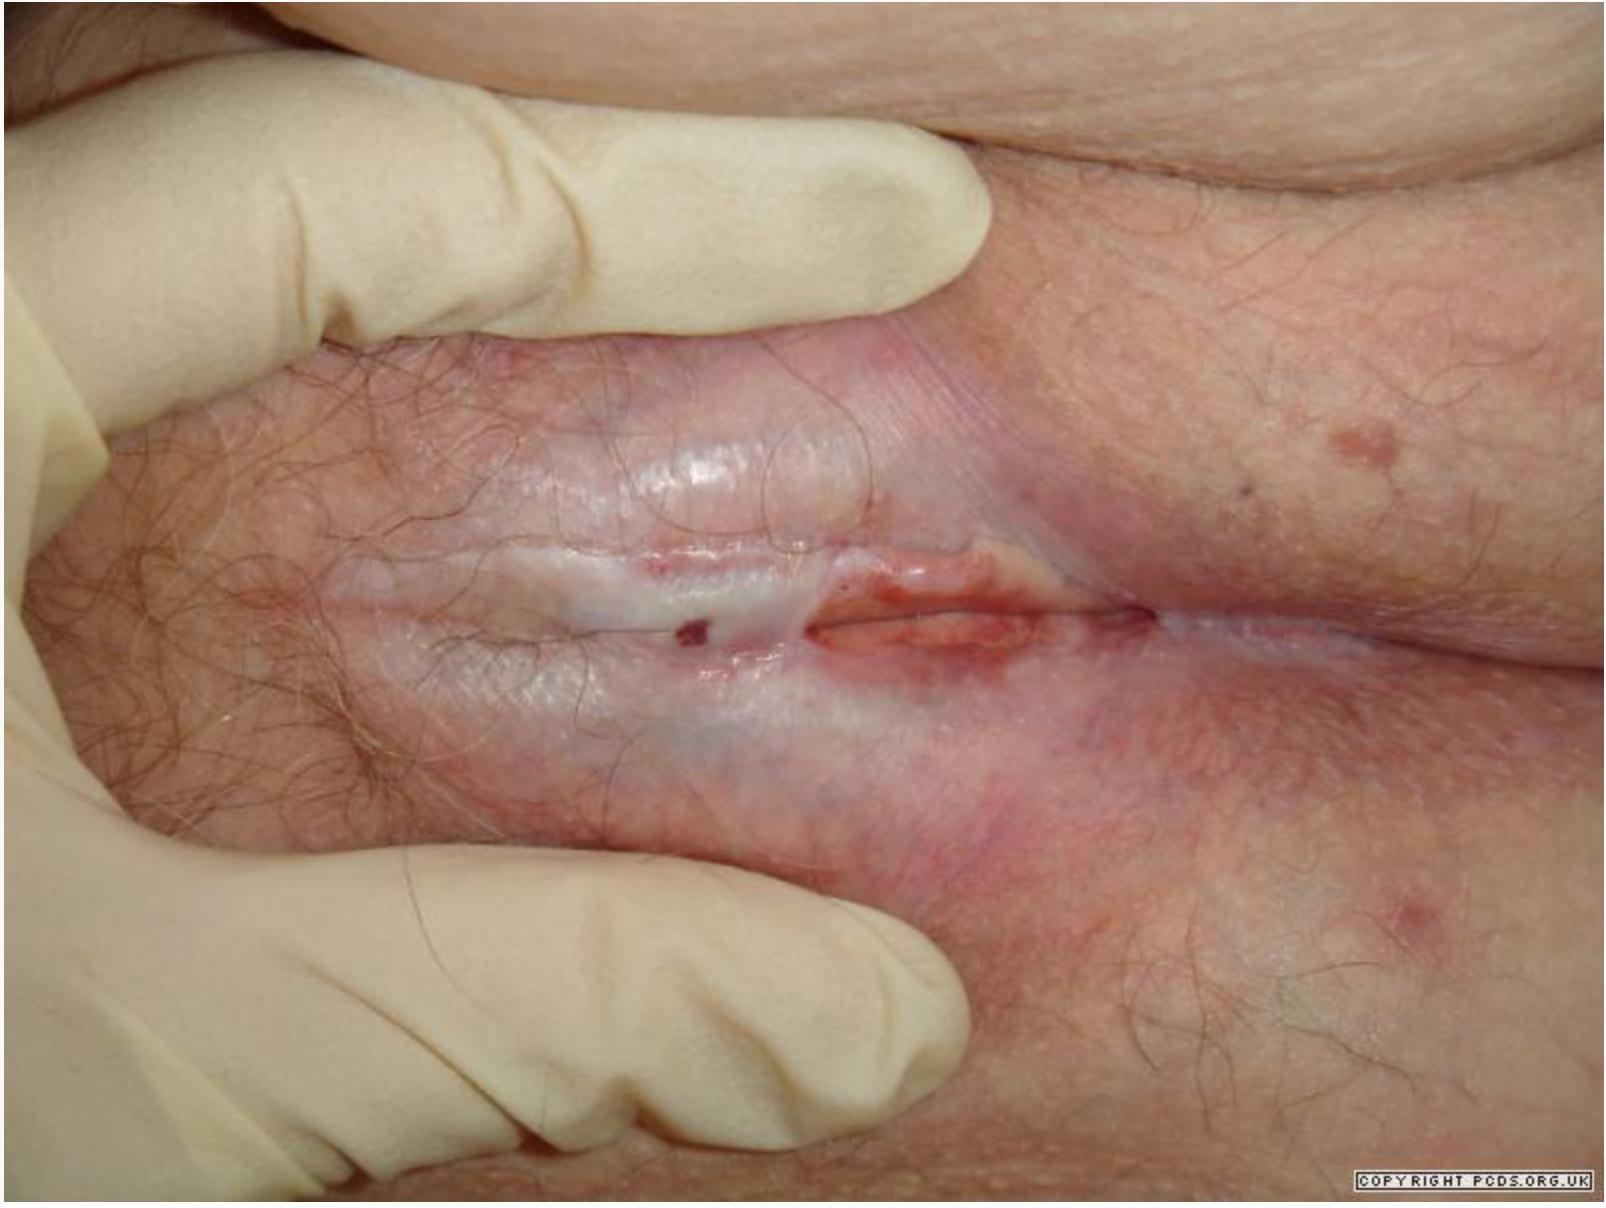 Skinny ass spreading porn pic